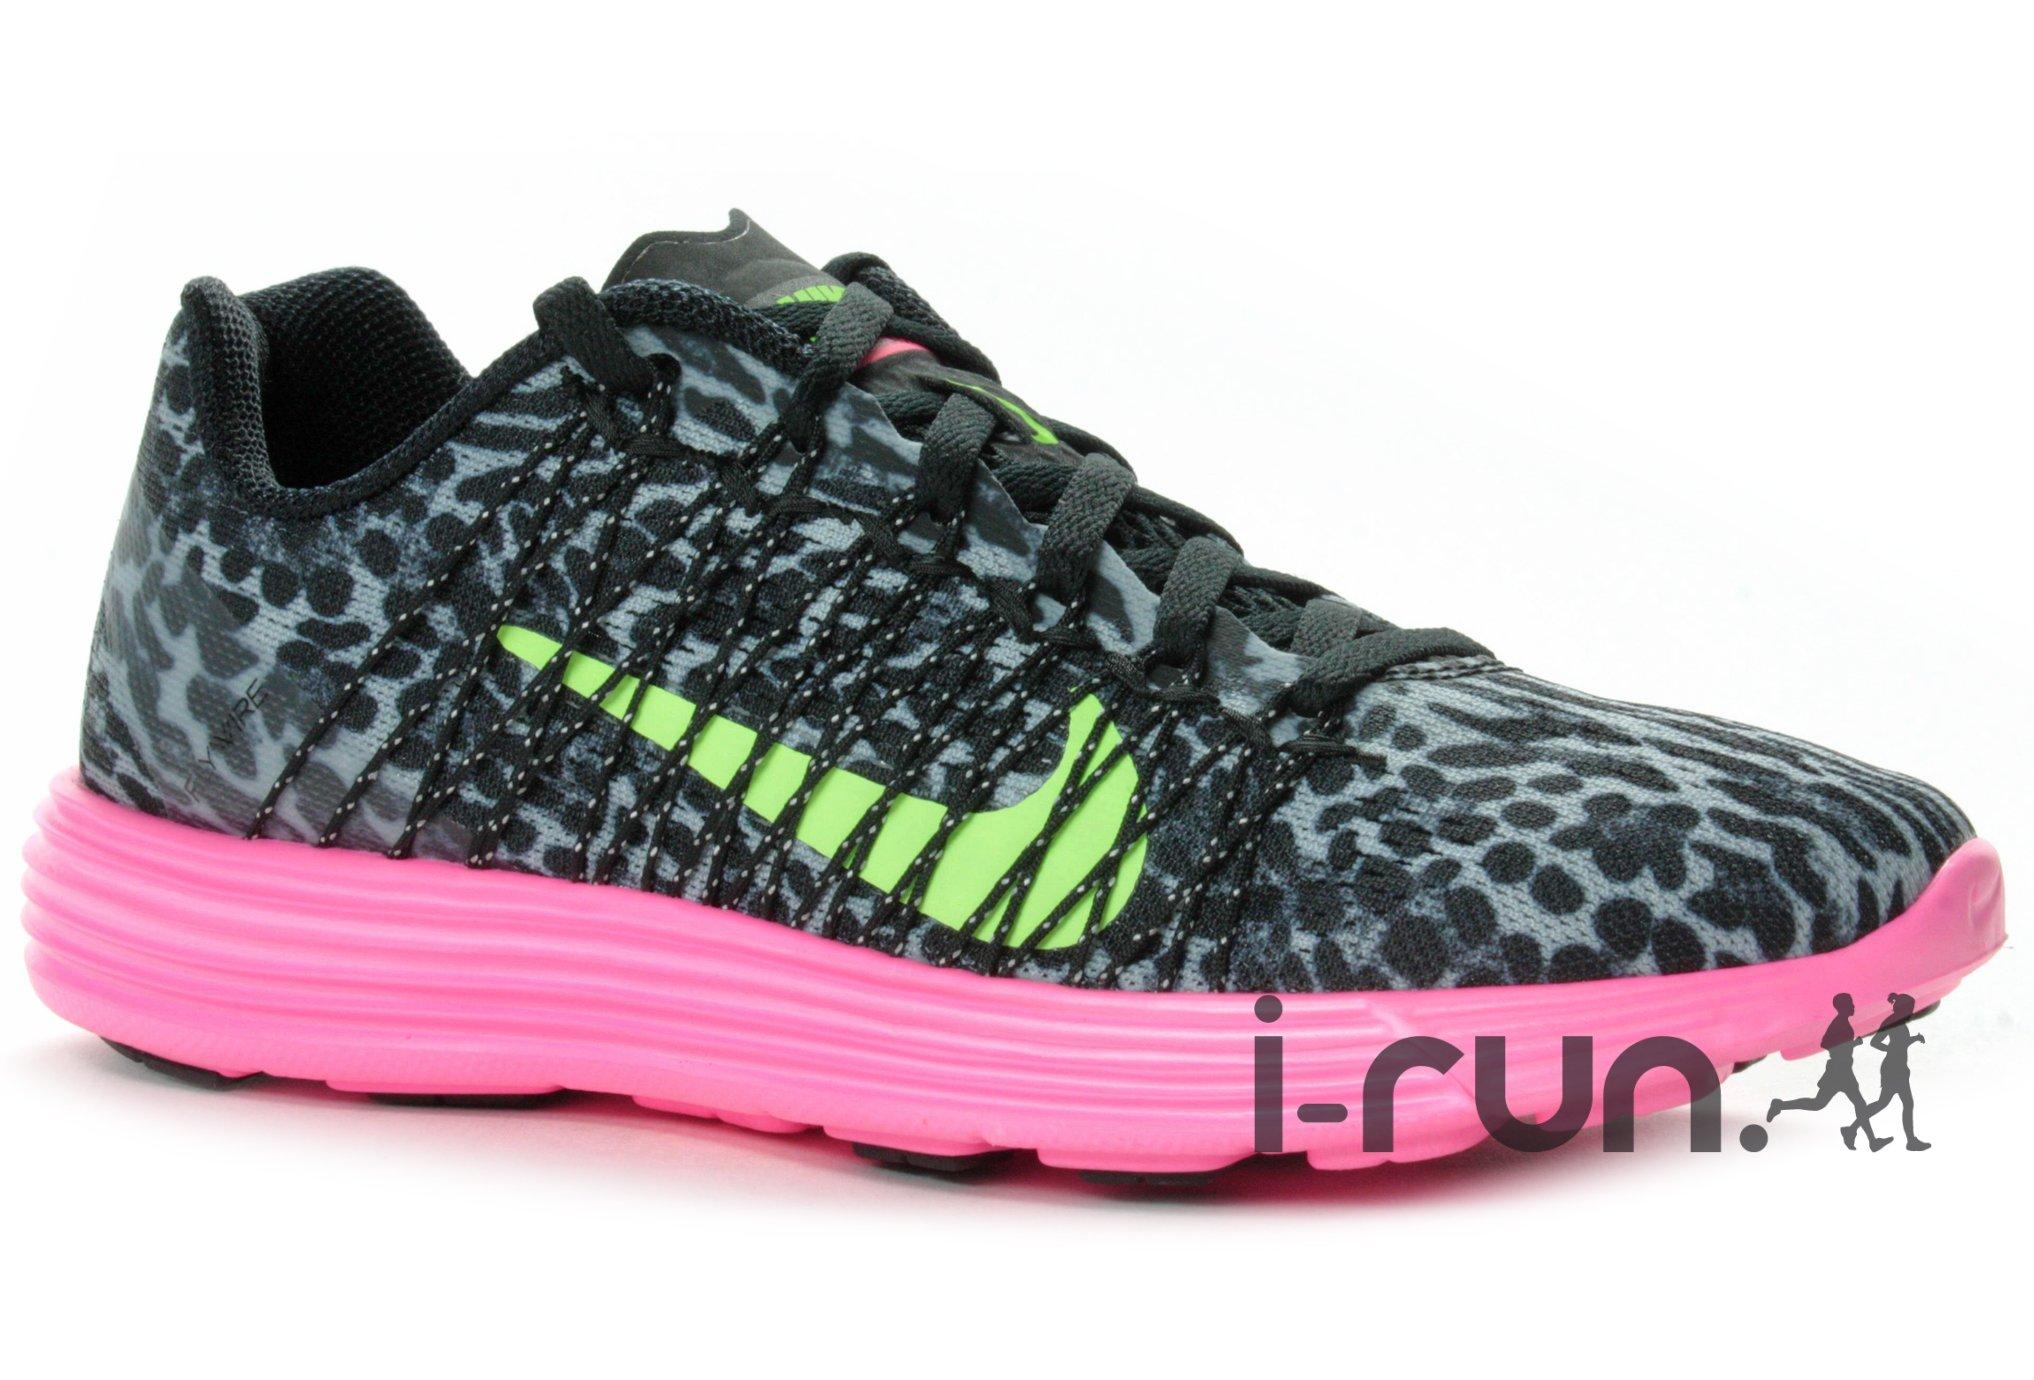 nike force max air cb - Nike Lunaracer+ 3 W pas cher - Chaussures running femme Nike ...